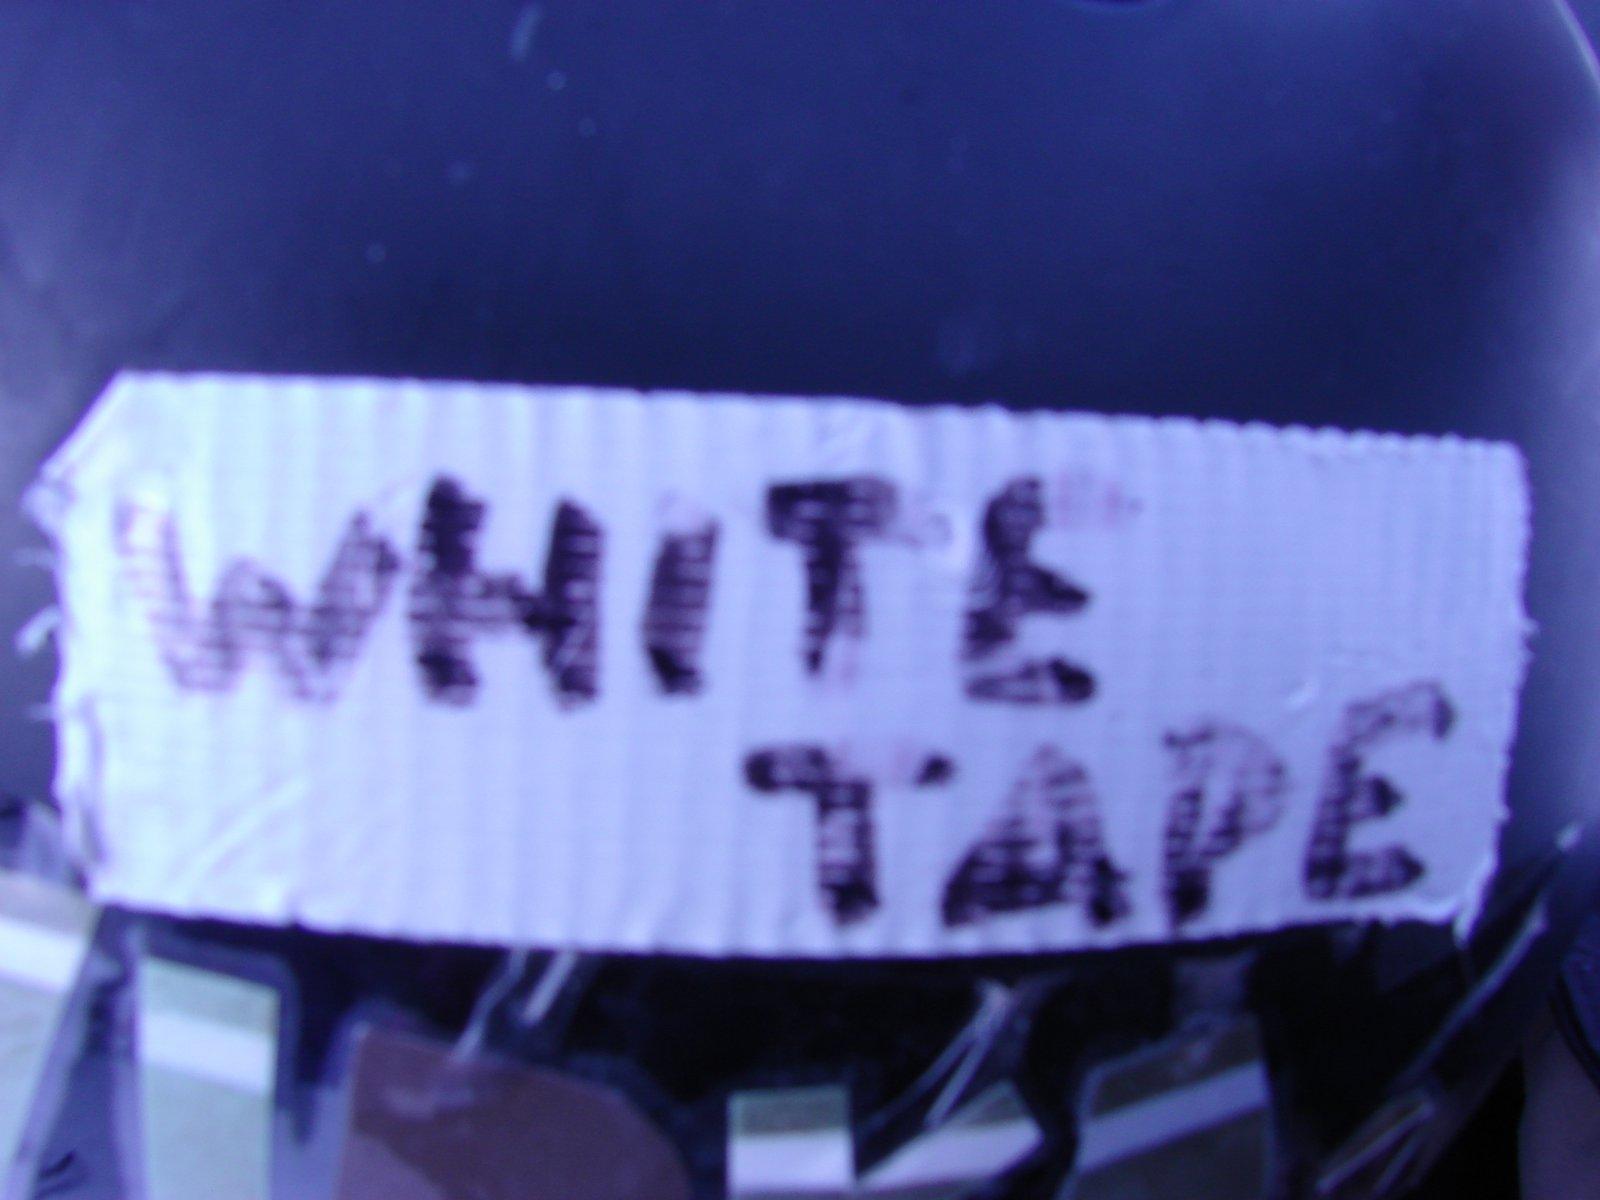 Whitetape fo real